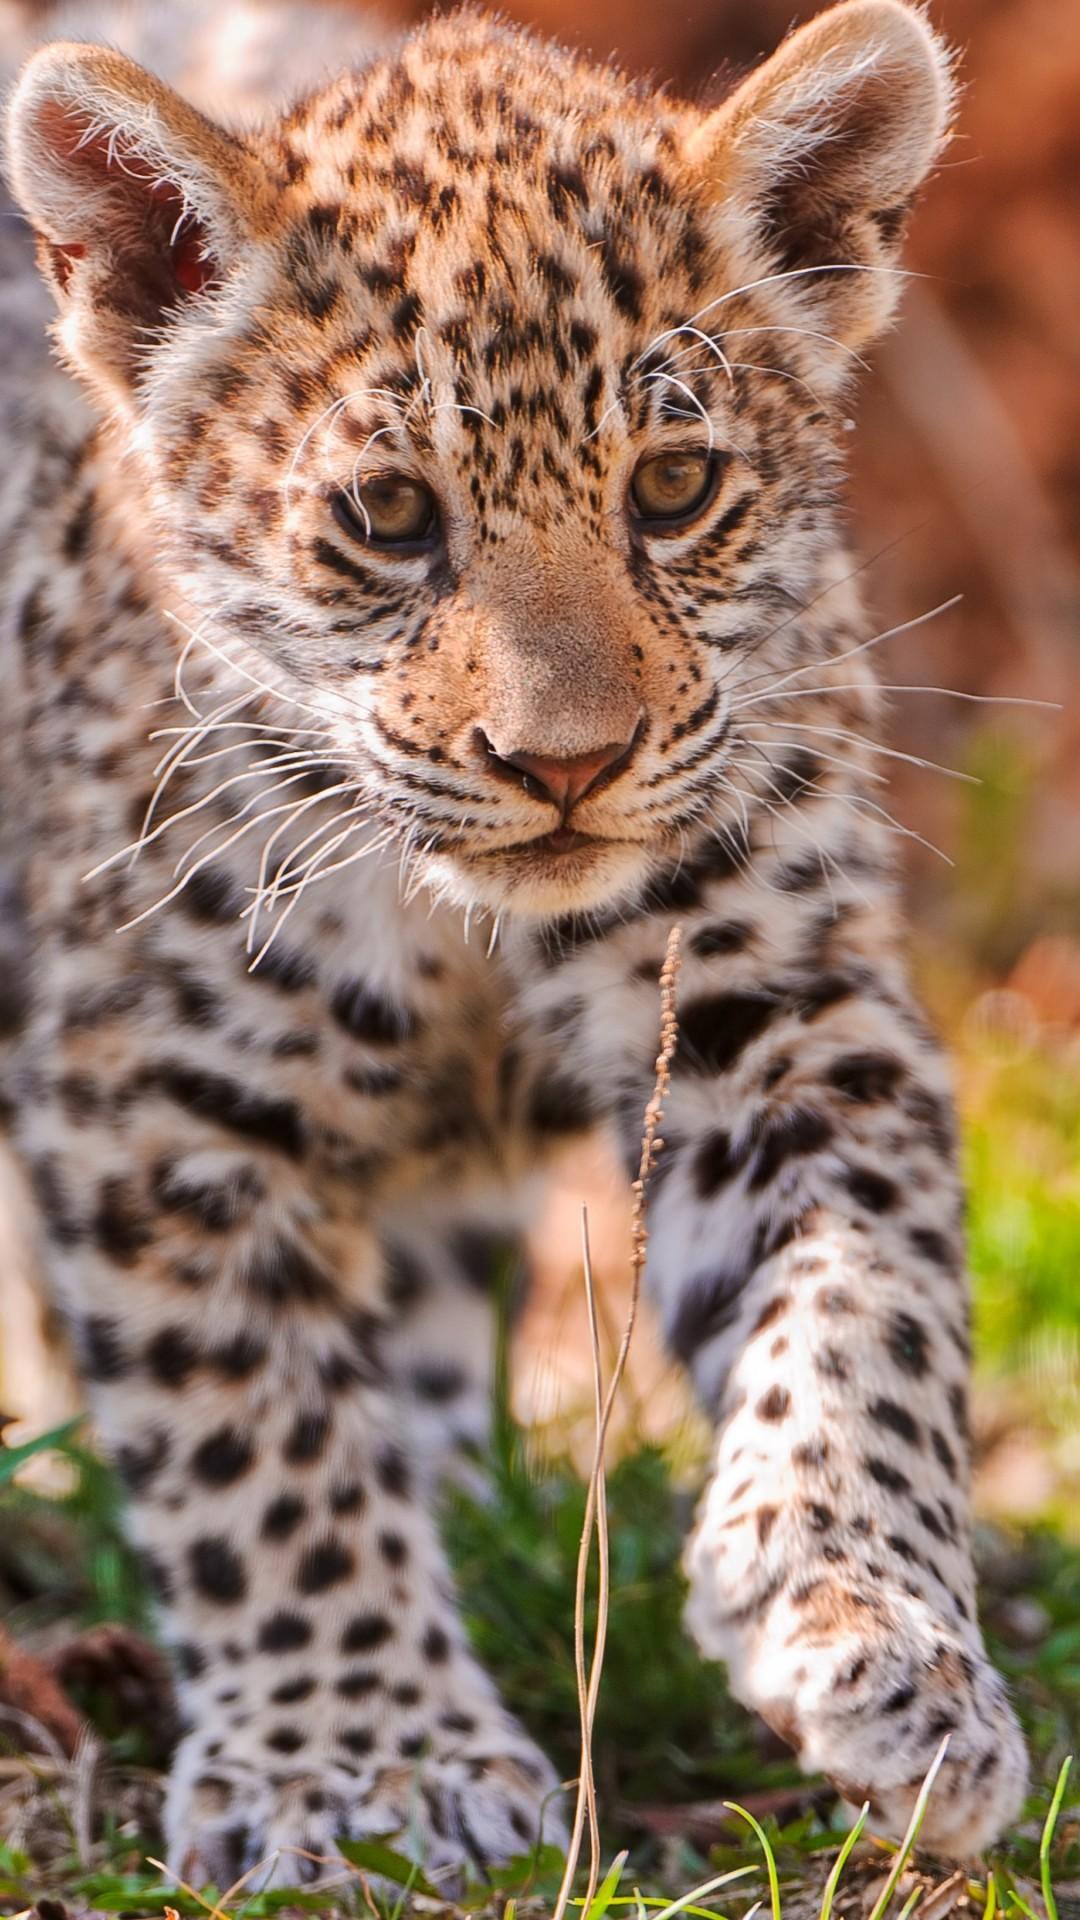 Wallpaper Jaguar Wild Nature Cute Animal Animals 911